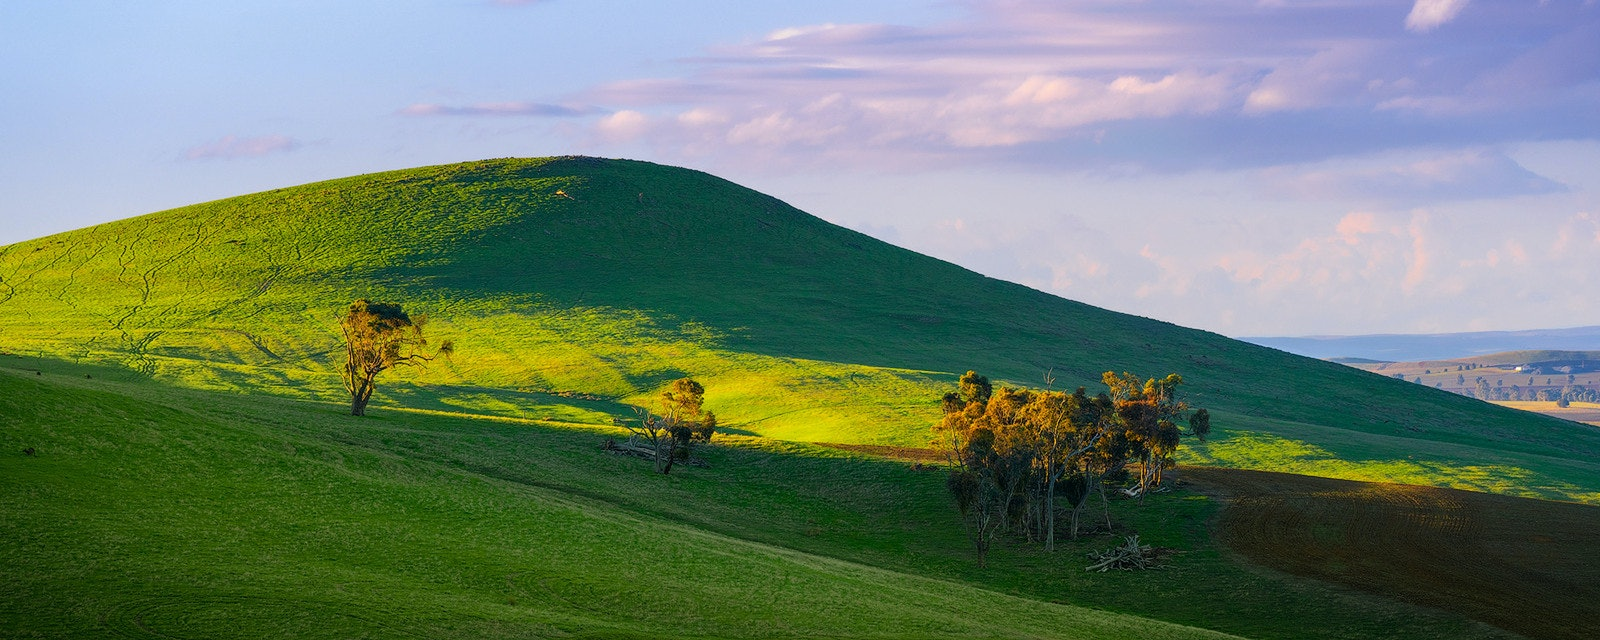 Lush - Clare Valley, SA